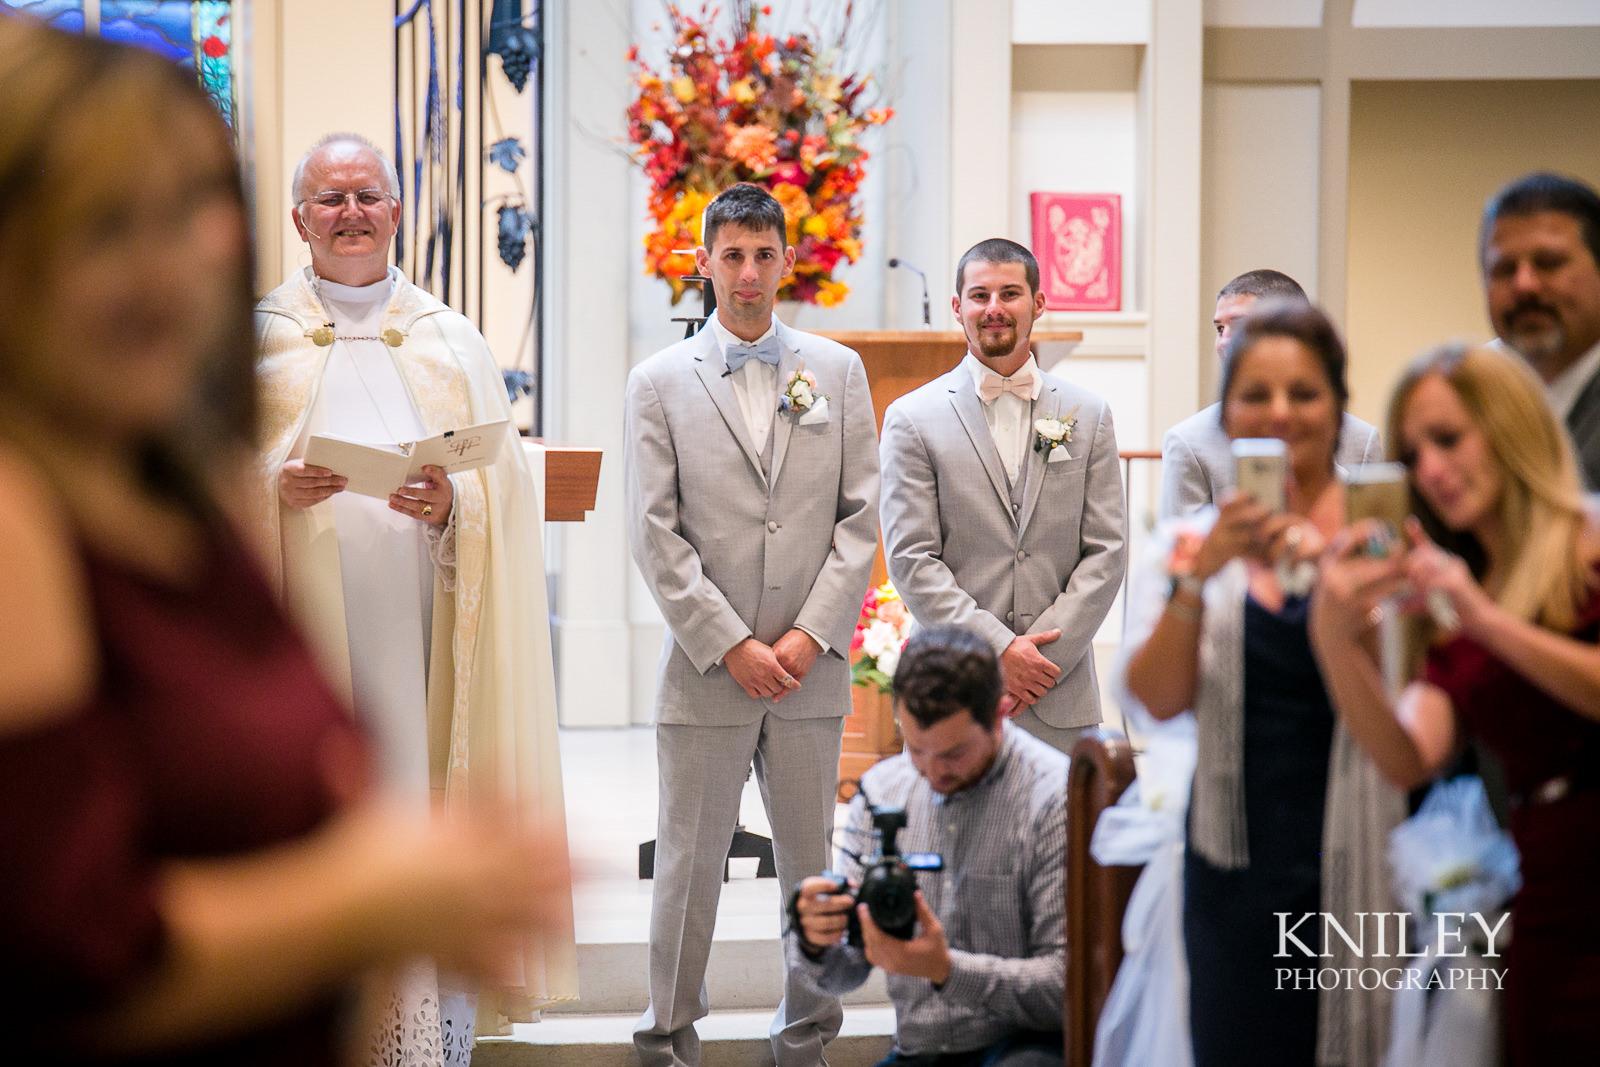 048 - Buffalo NY wedding pictures - St Marys Church - IMG_7870.jpg